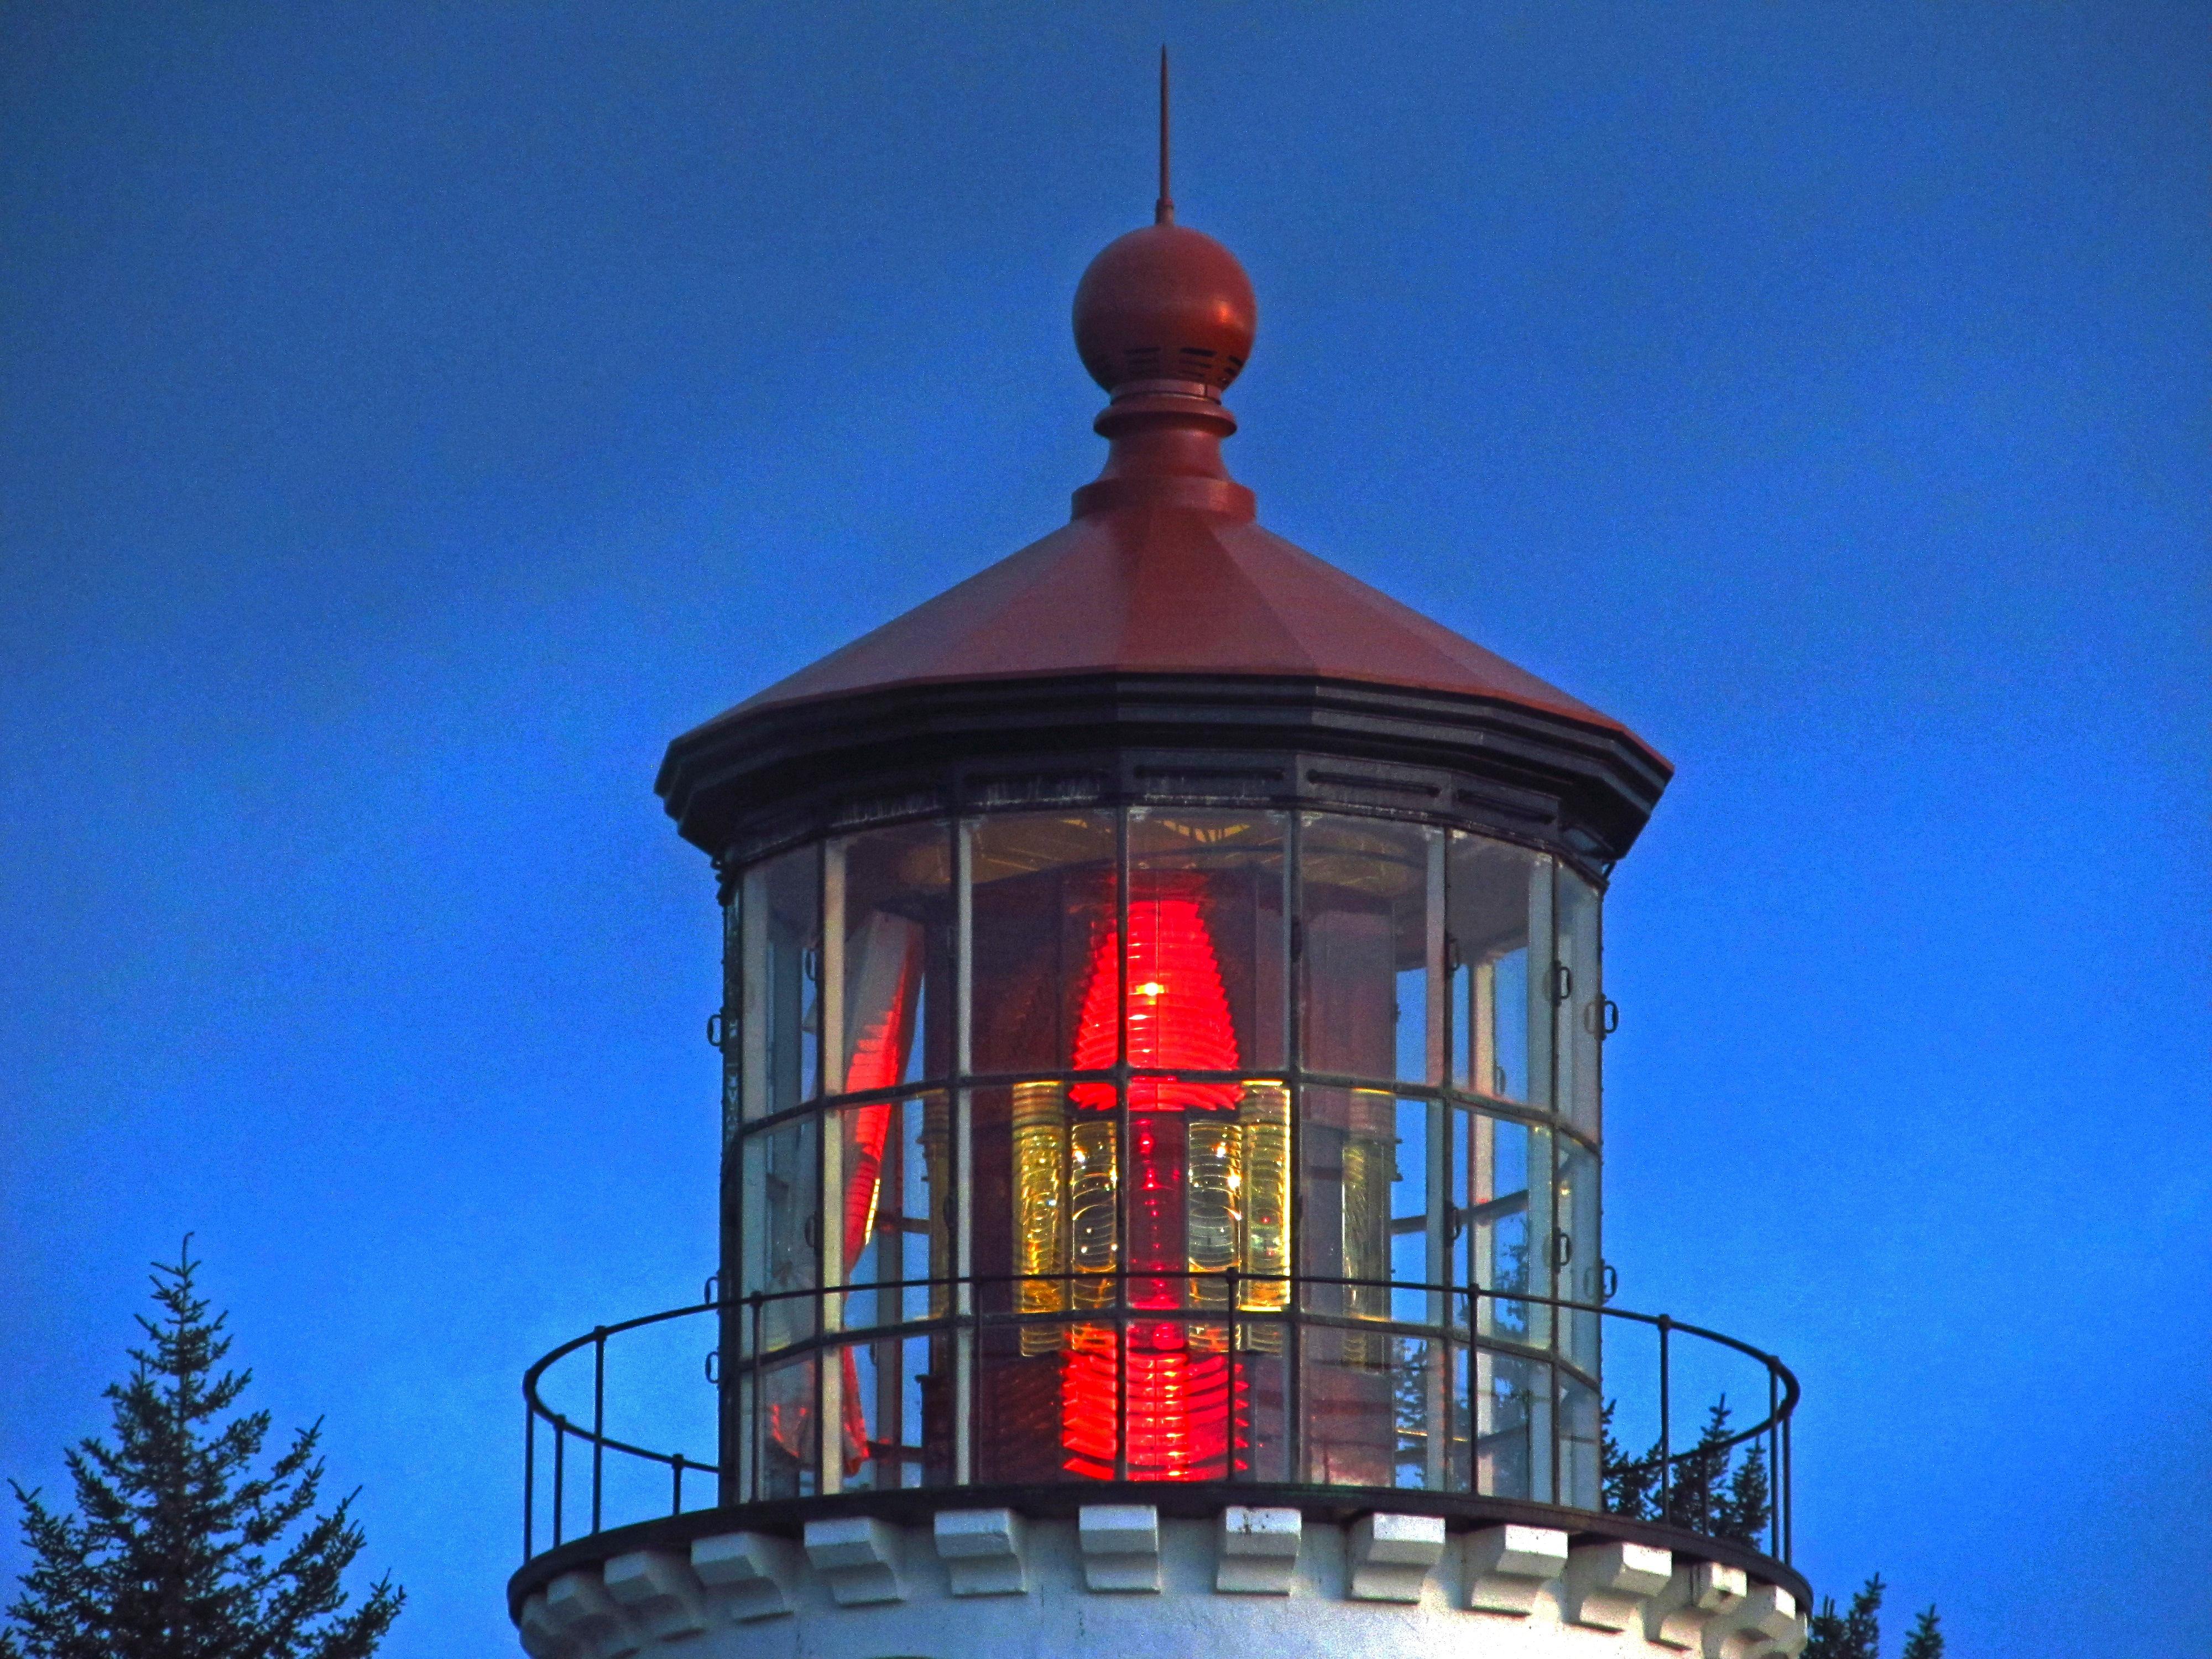 Umpqua River Lighthouse Umpqua River Lighthouse